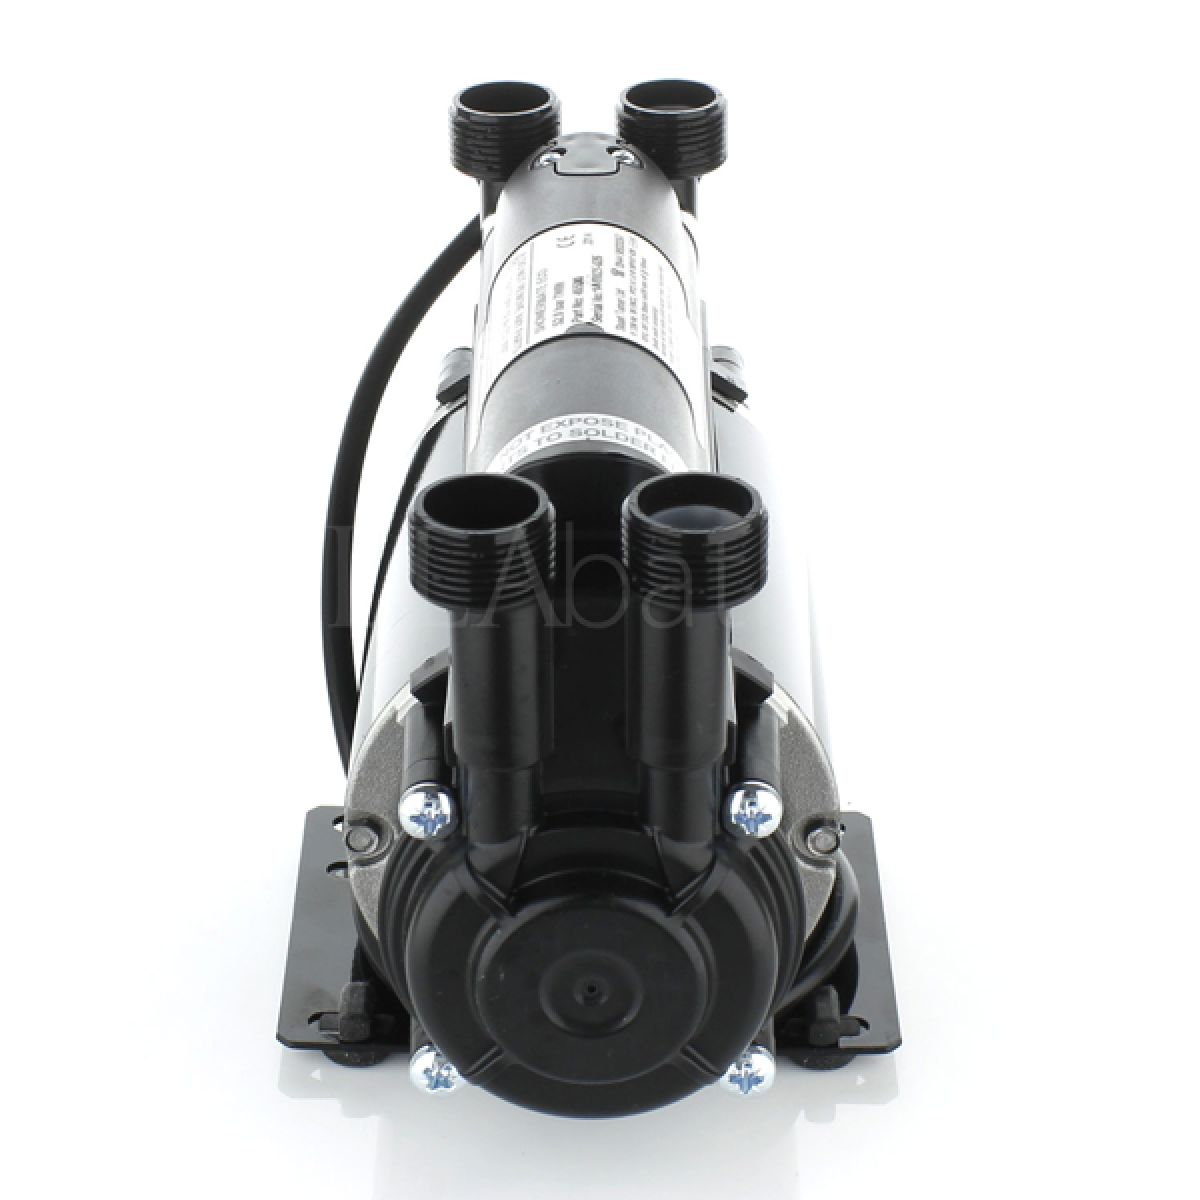 Stuart Turner 46500 Showermate Eco Standard Twin 2.0 Bar Pump Left